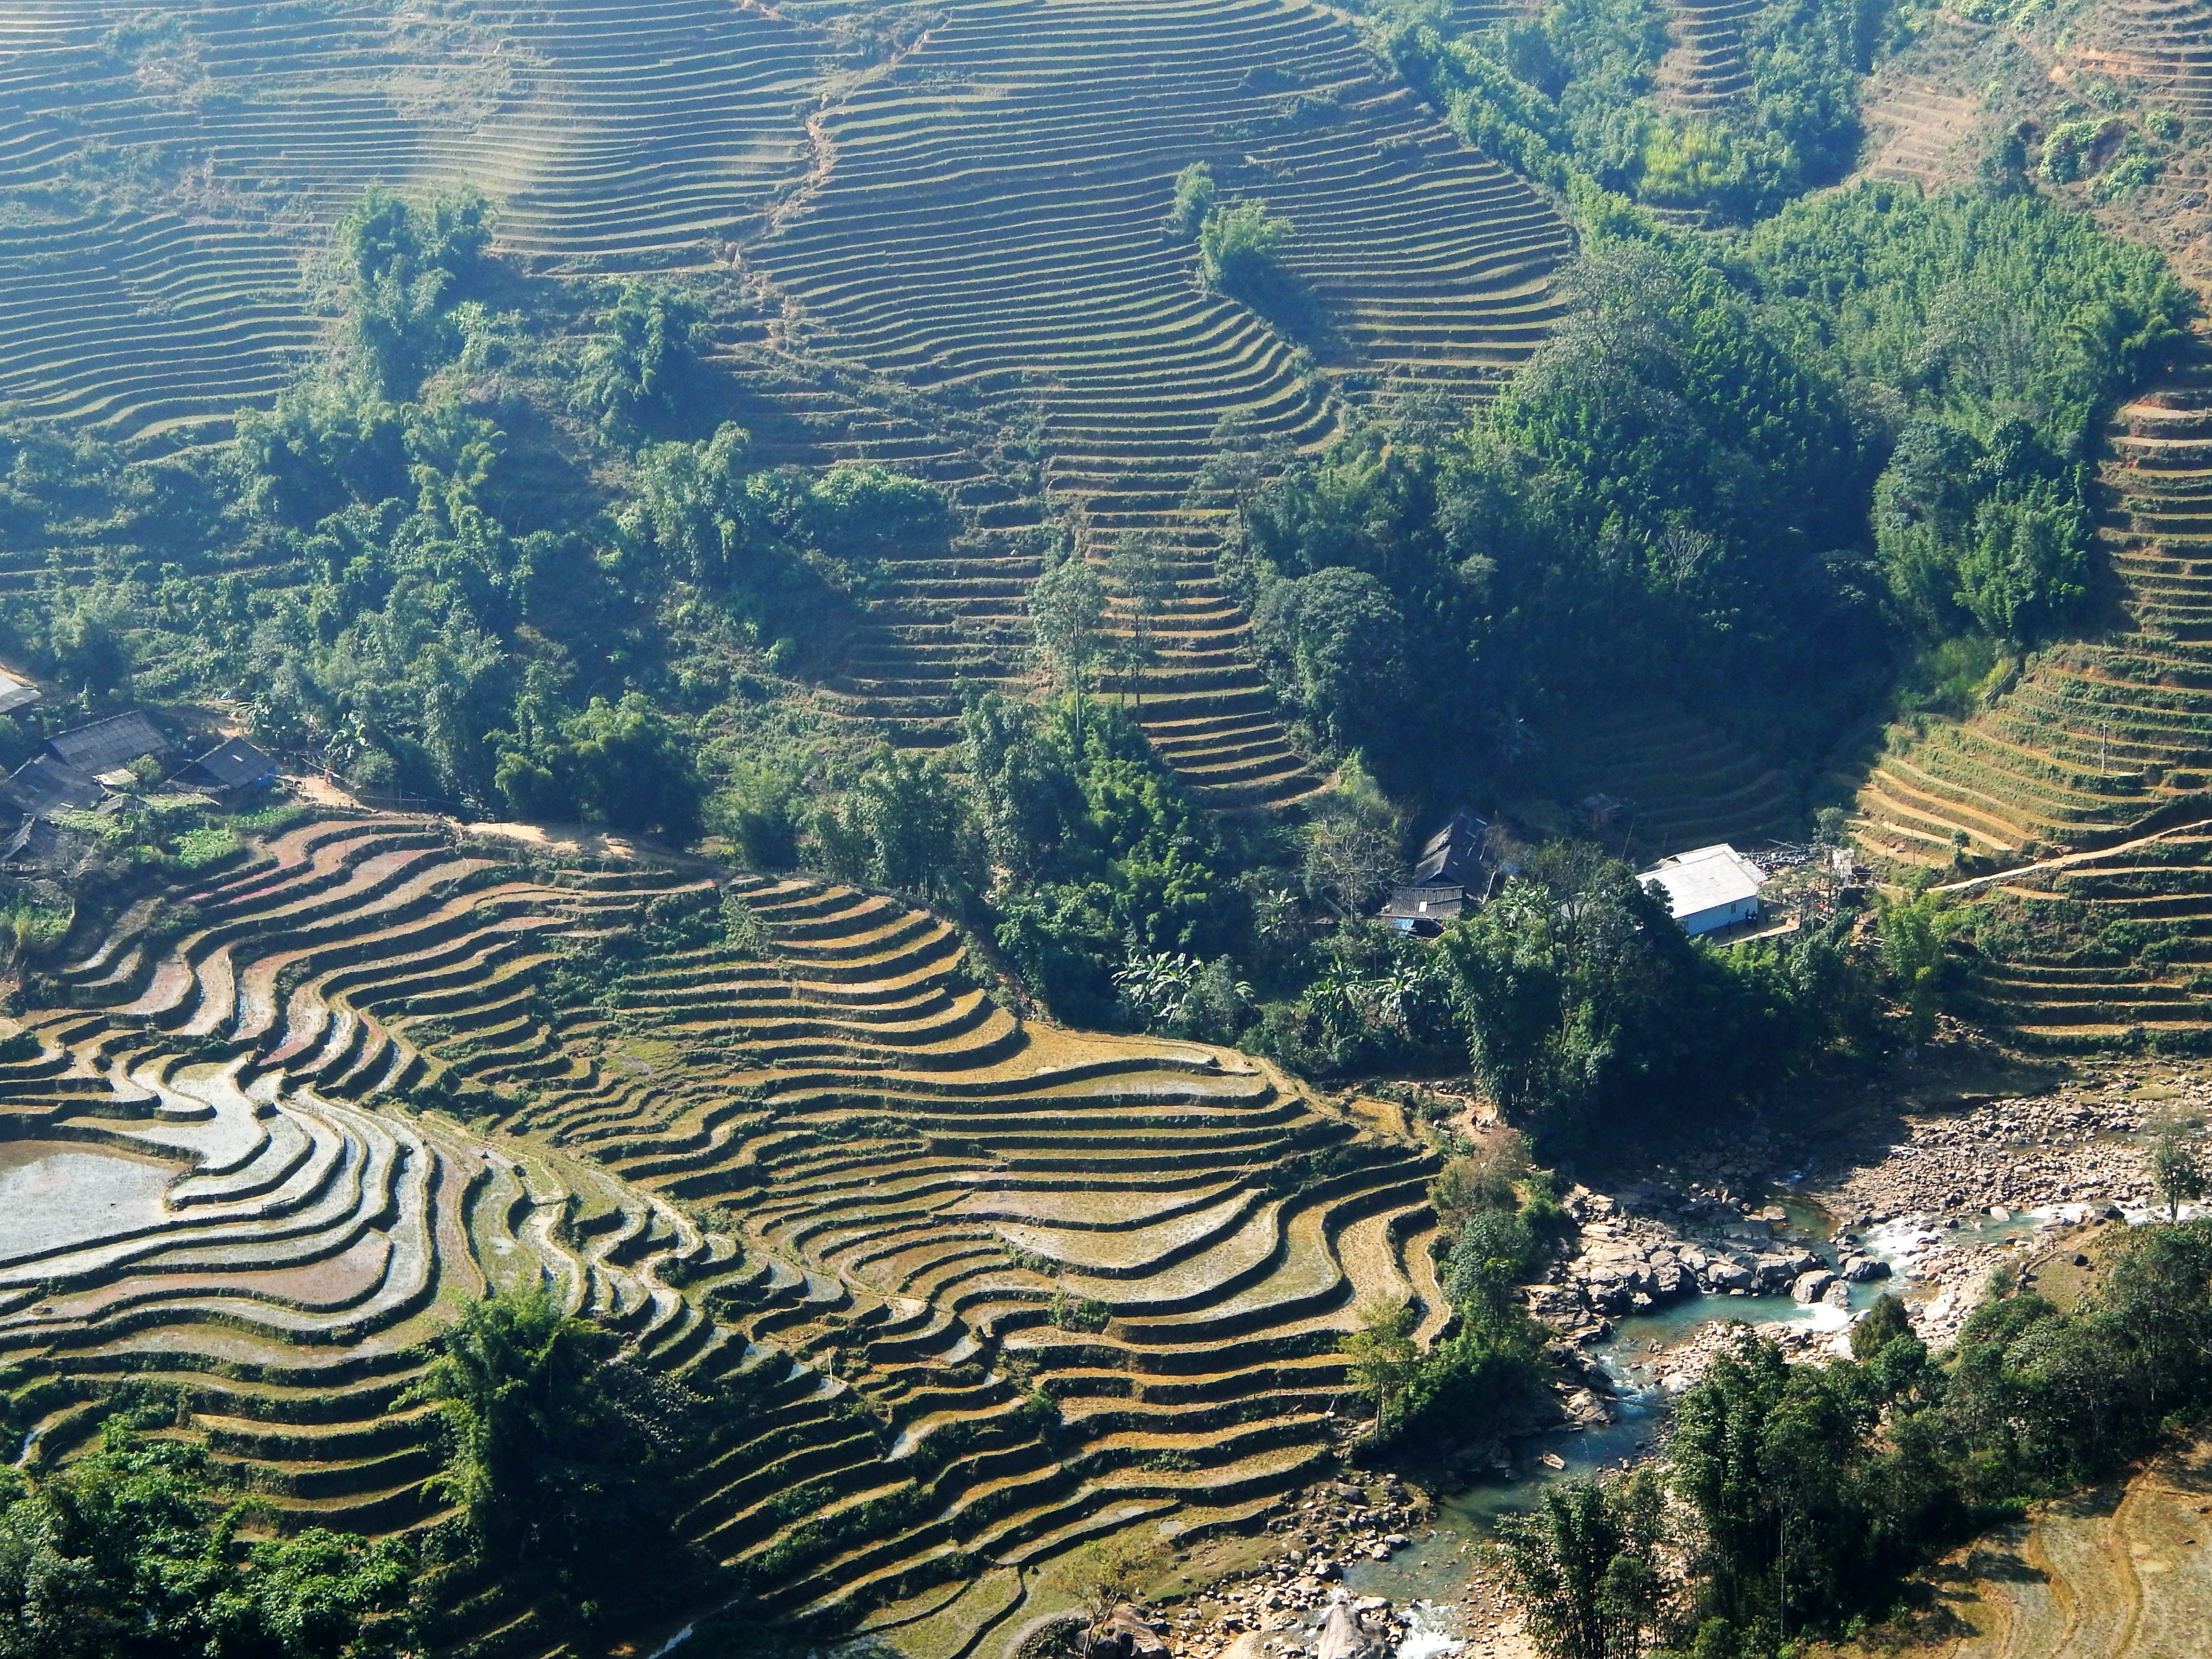 Traveling in northern Vietnam. Muong Hoa valley - Hoang Lien. www.north-vietnam.com... #vietnam #trekking #travel #wander #valley #mountains #hmong